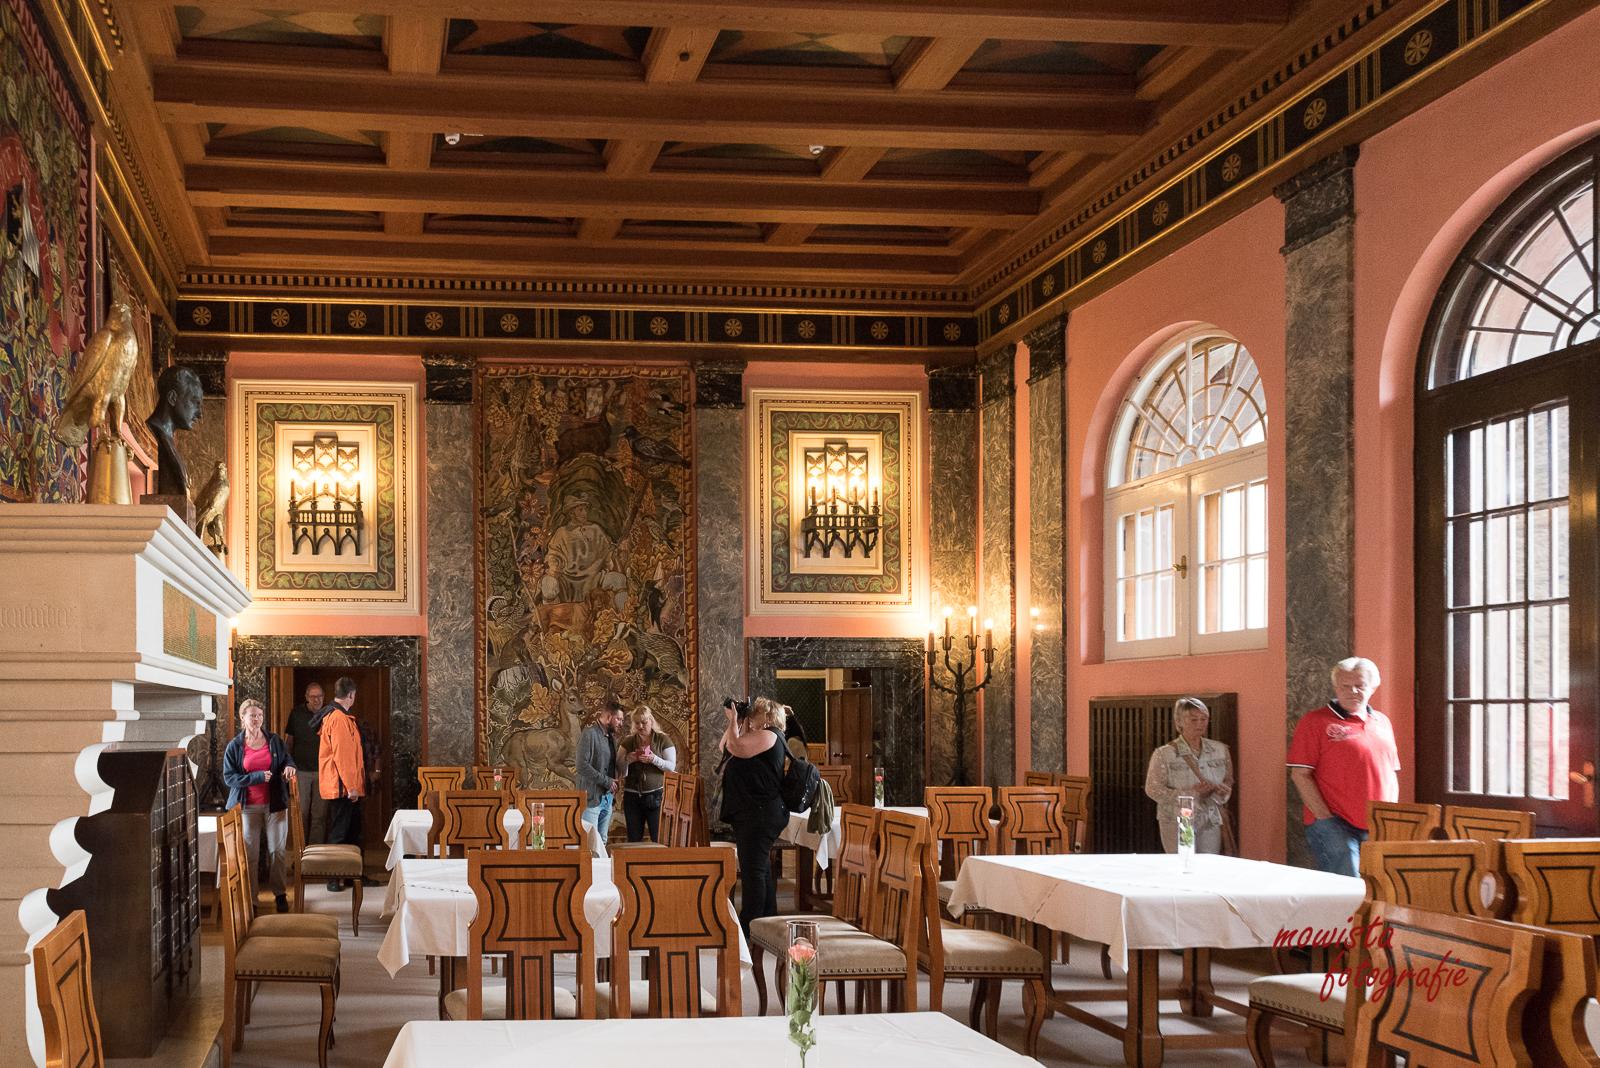 20170722_MW_DSC_5377_Schloss Ringberg